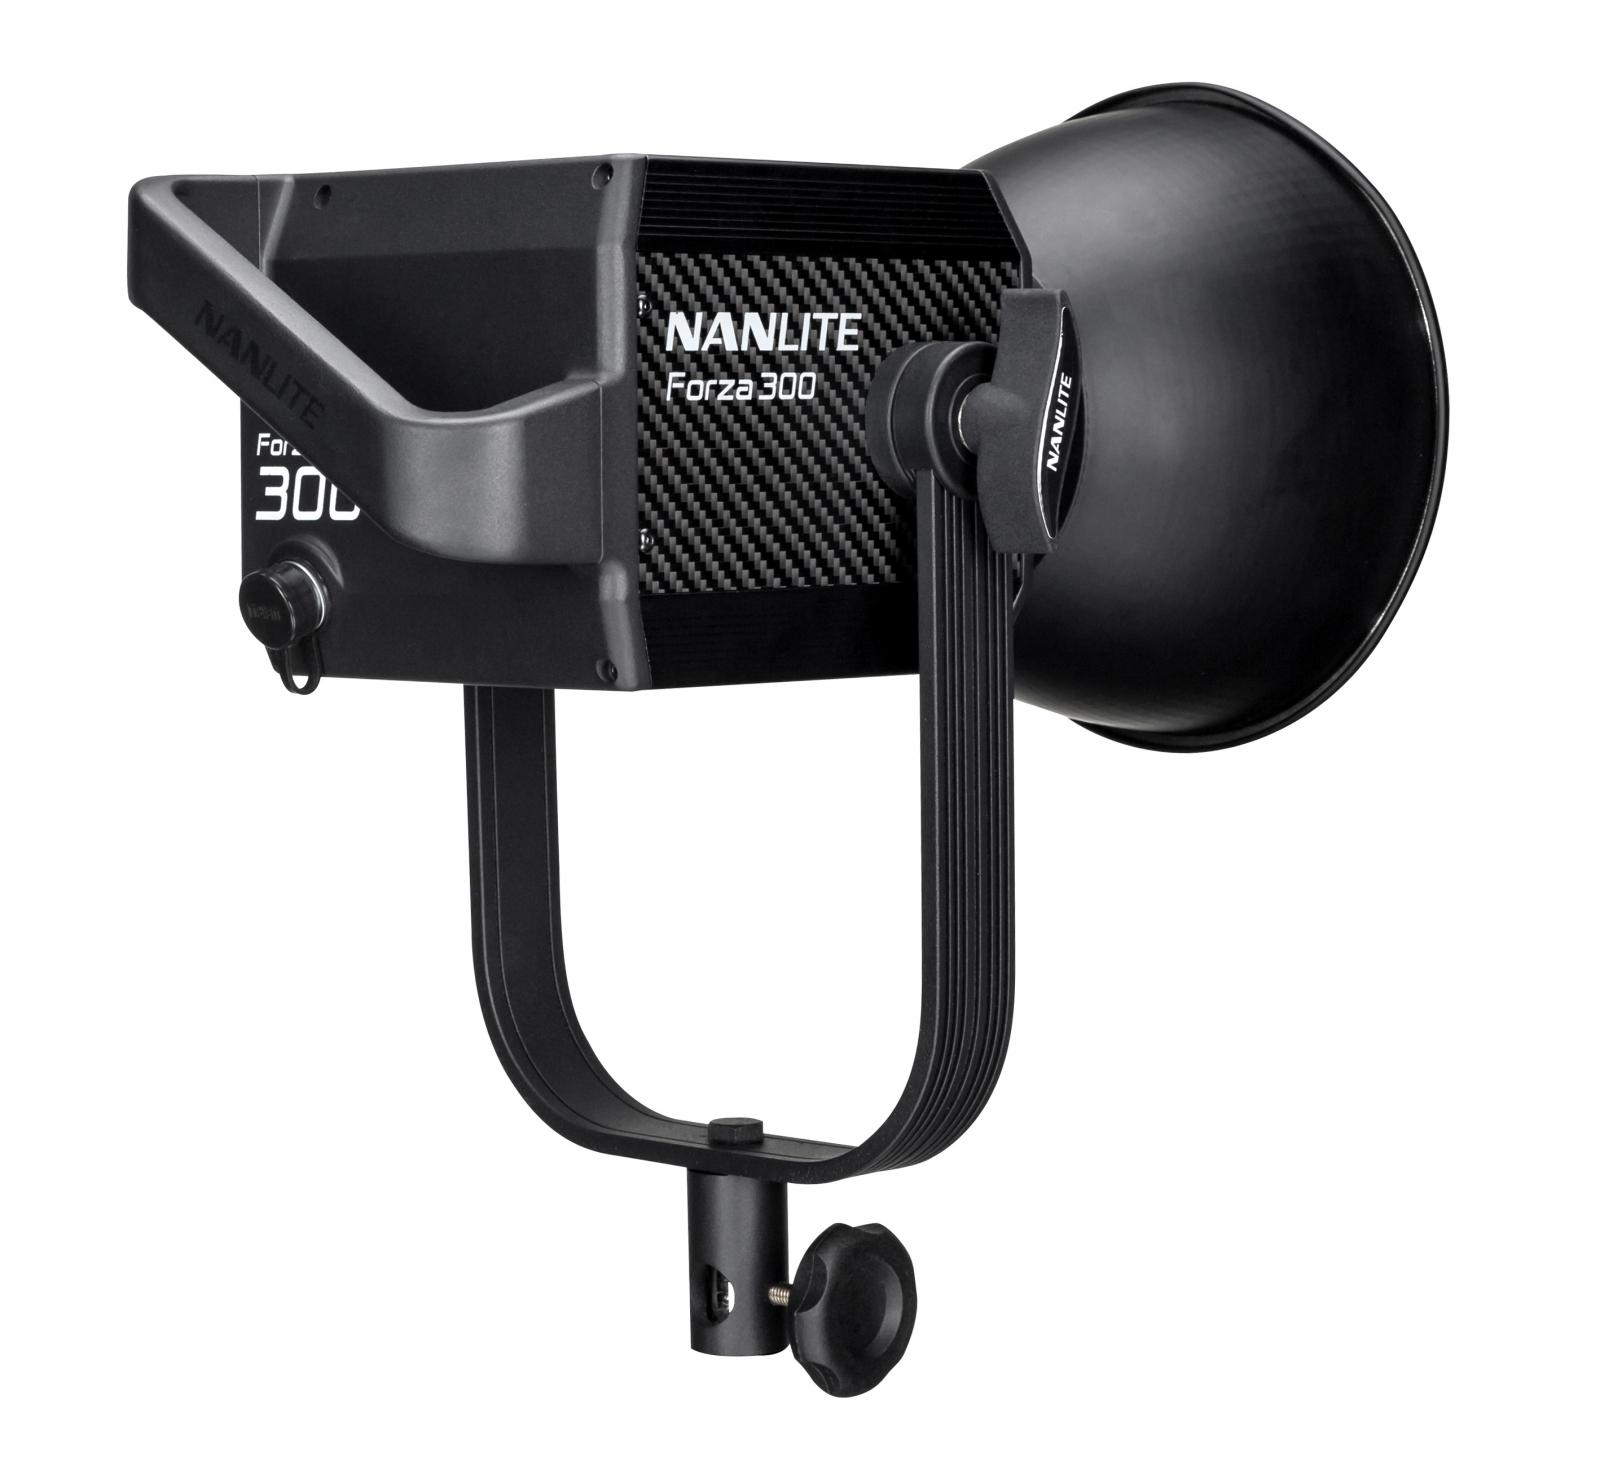 KAISER NANLITE Forza 300 LED-Leuchte